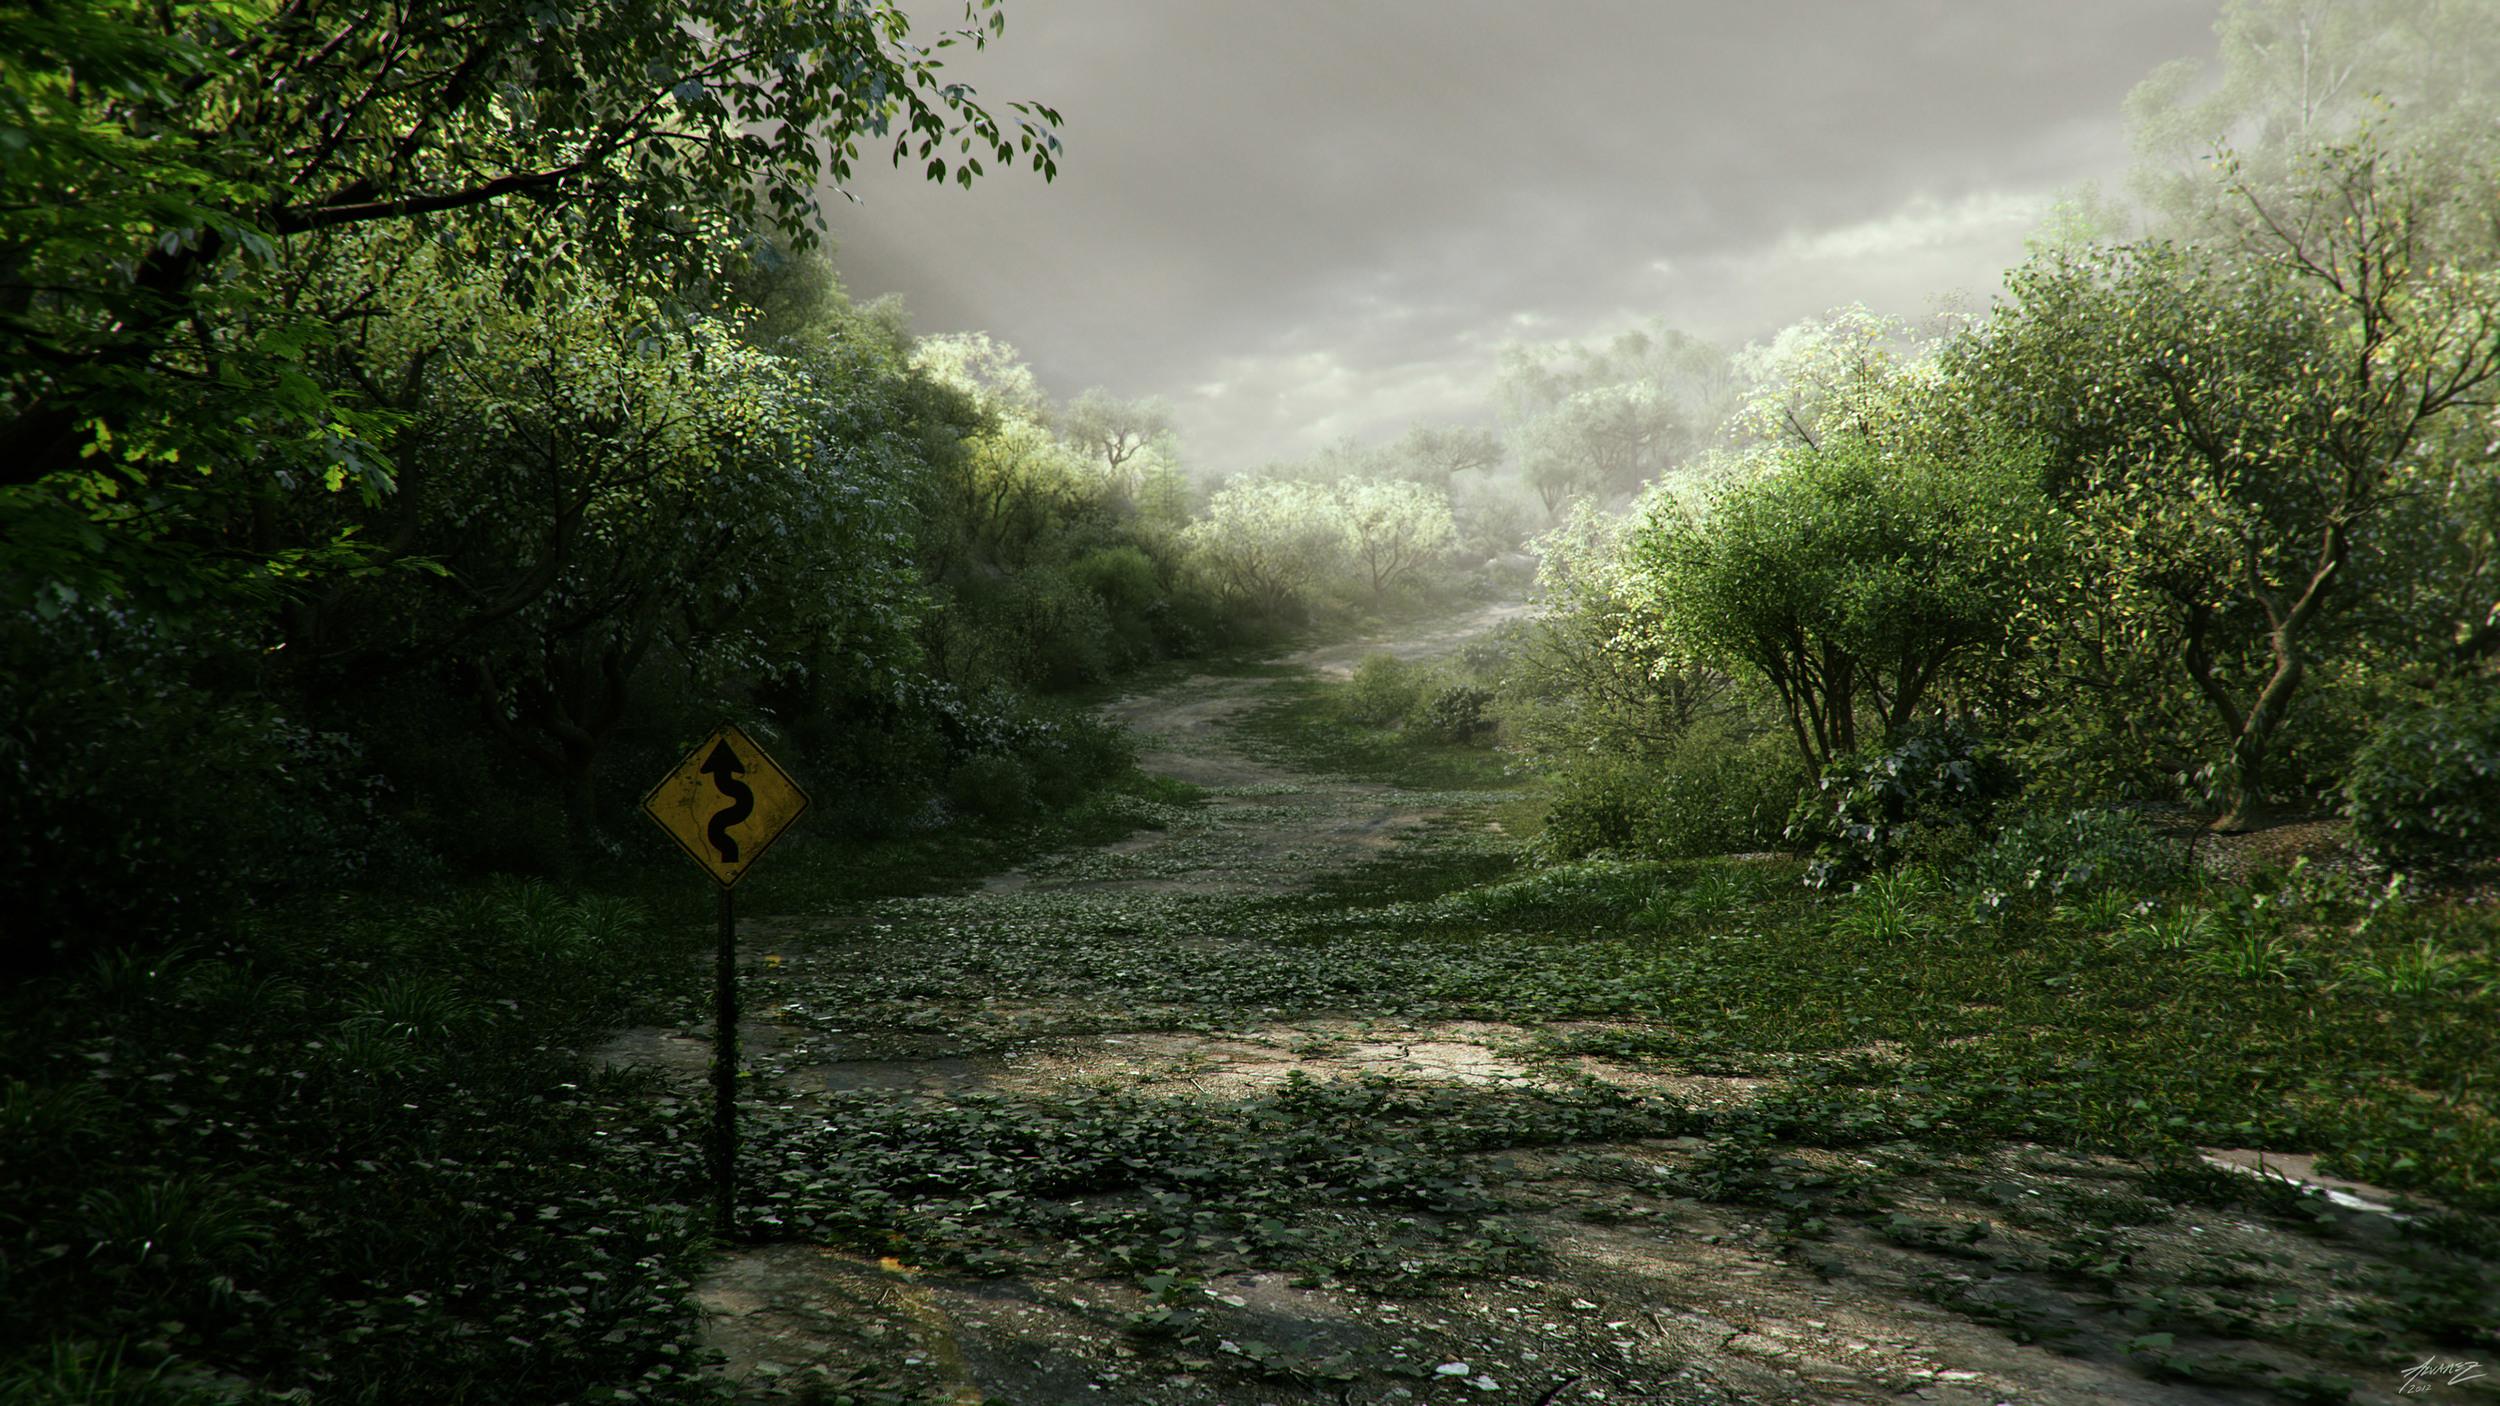 HighwayOvergrowth_4k.jpg